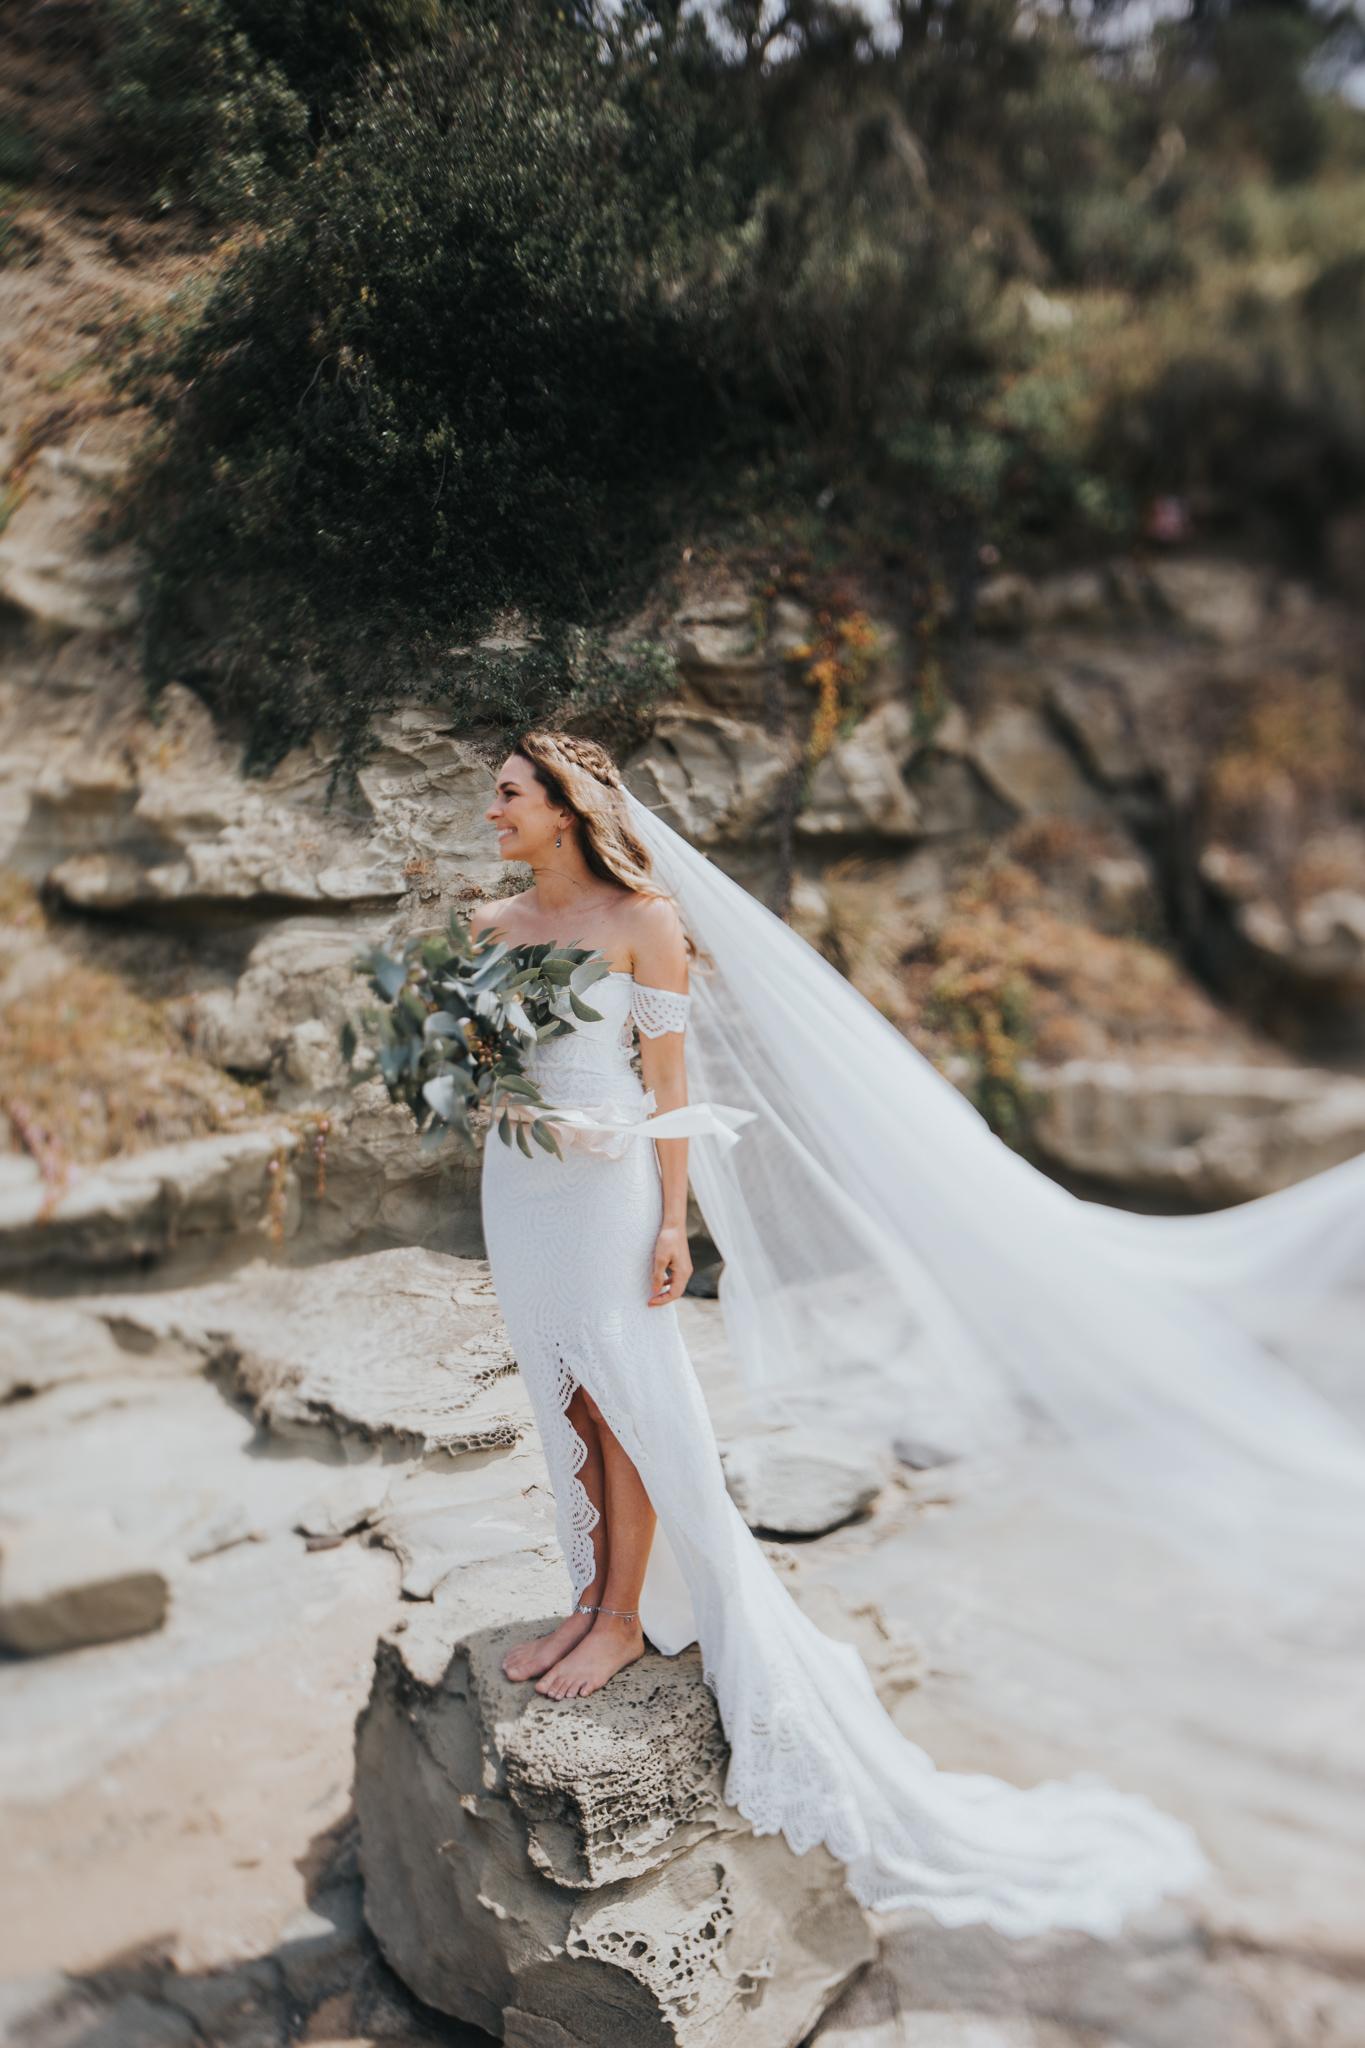 Inverloch wedding #graceloveslace #theuniquebride